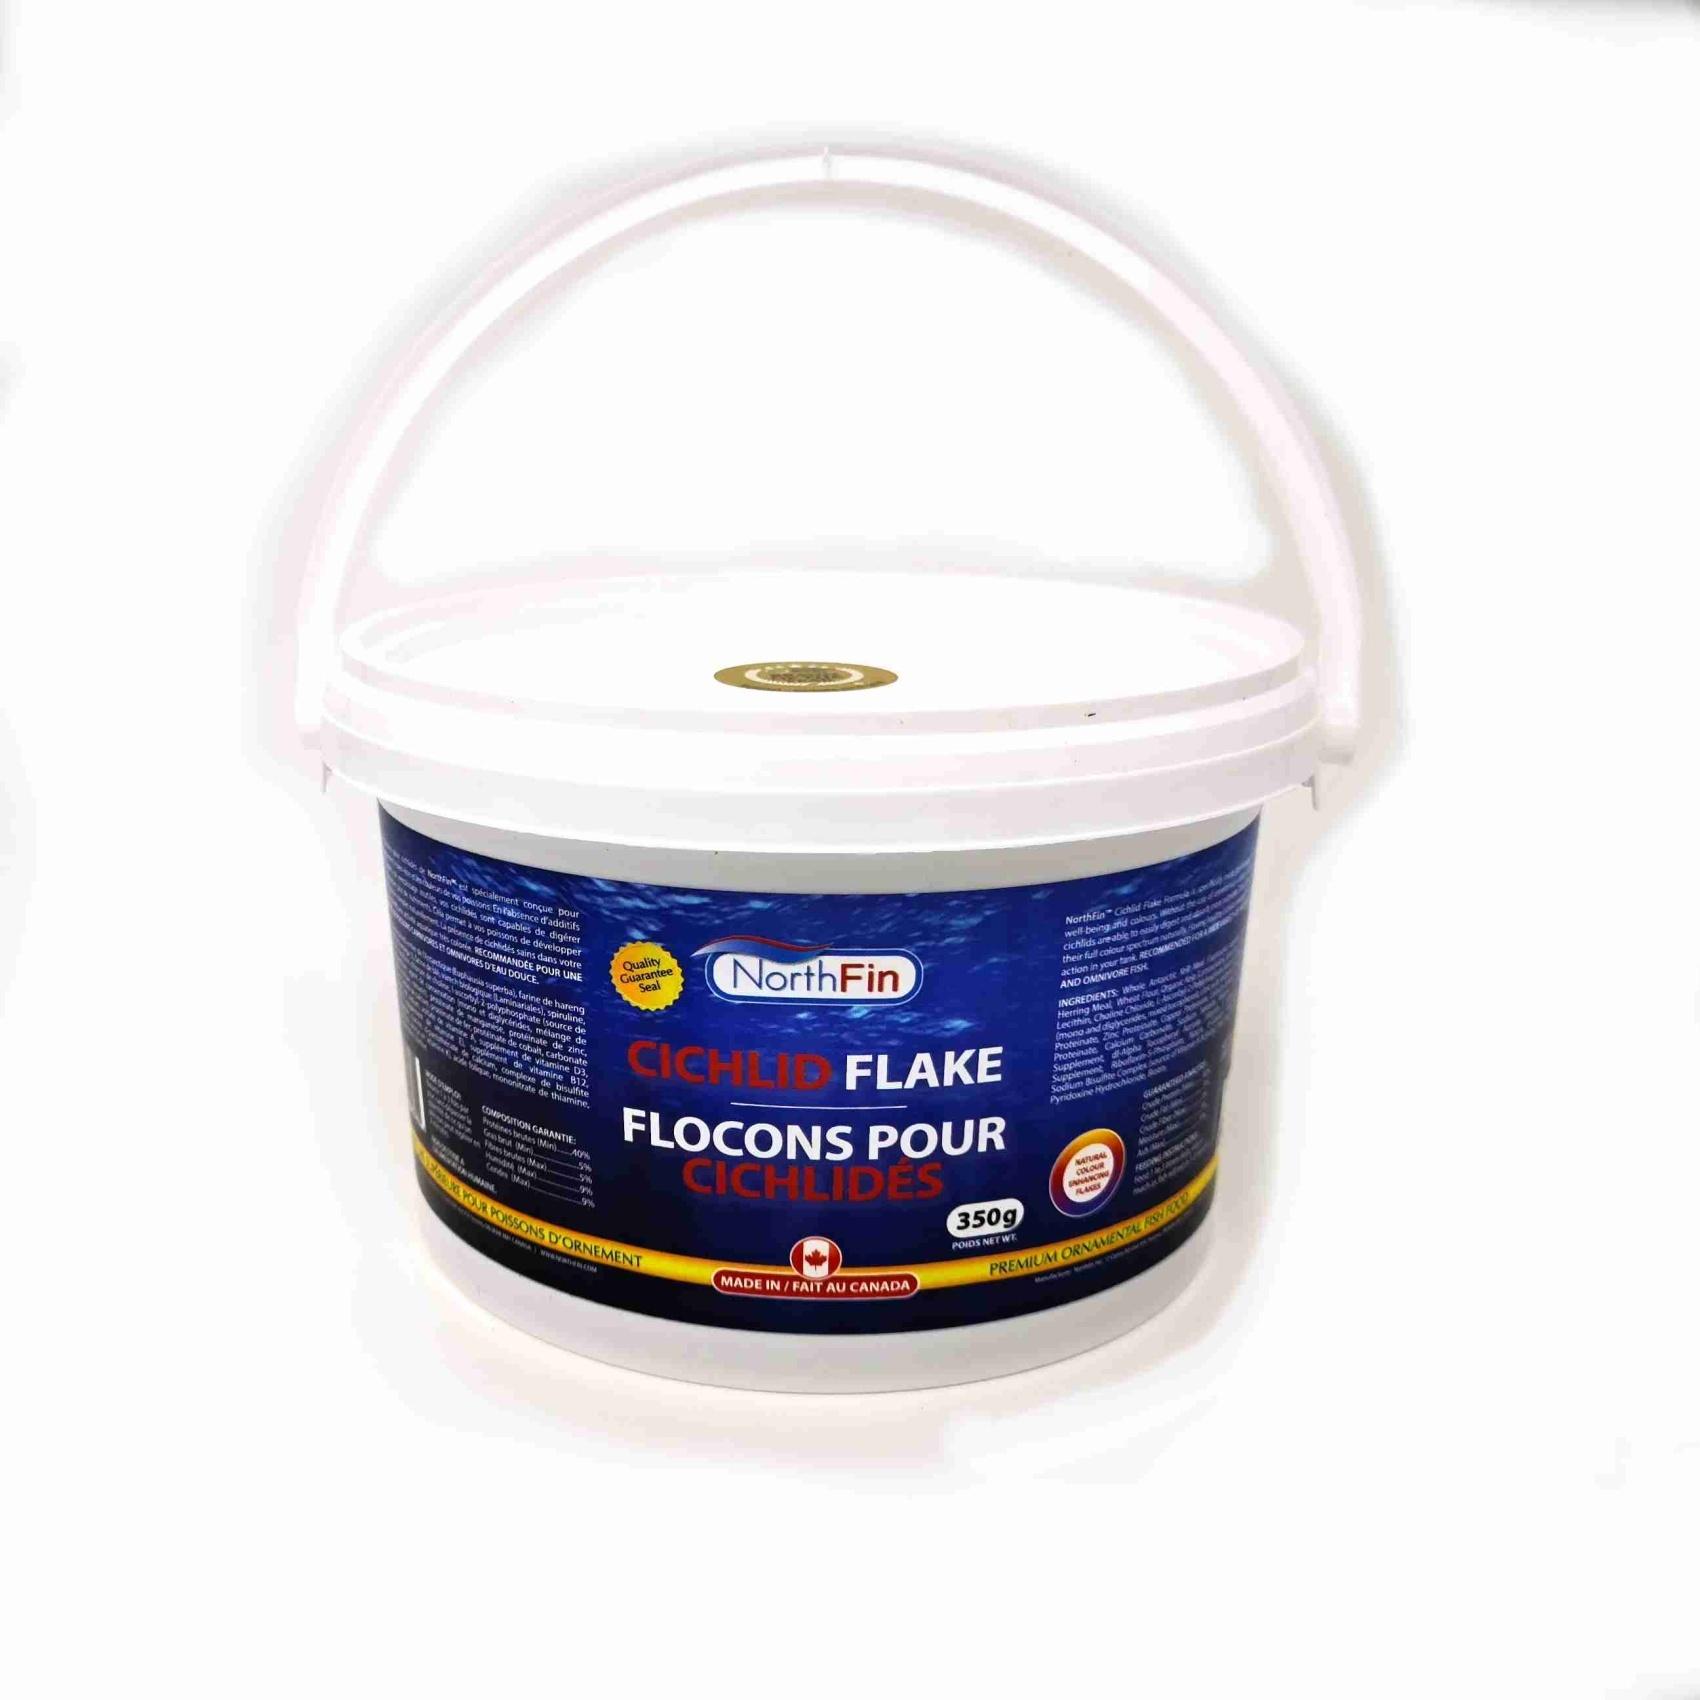 NorthFin Northfin Cichlid Flake 350g